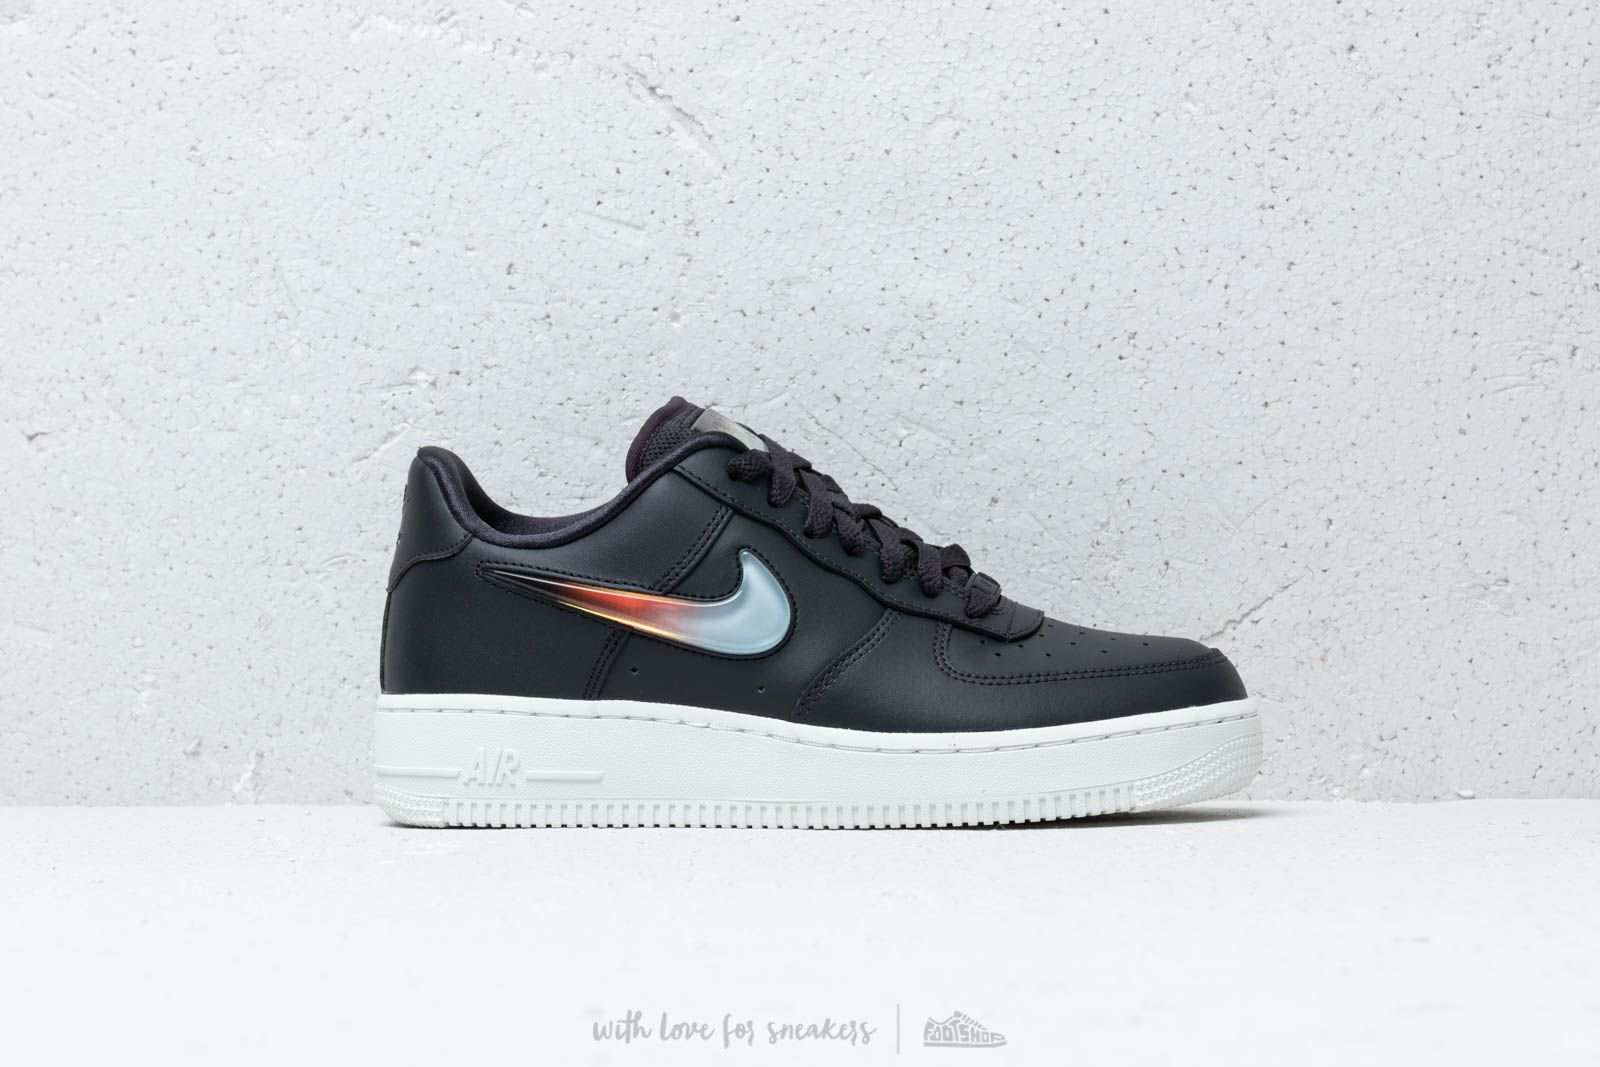 Nike Air Force 1 '07 SE Premium Oil GreyBright Crimson For Sale